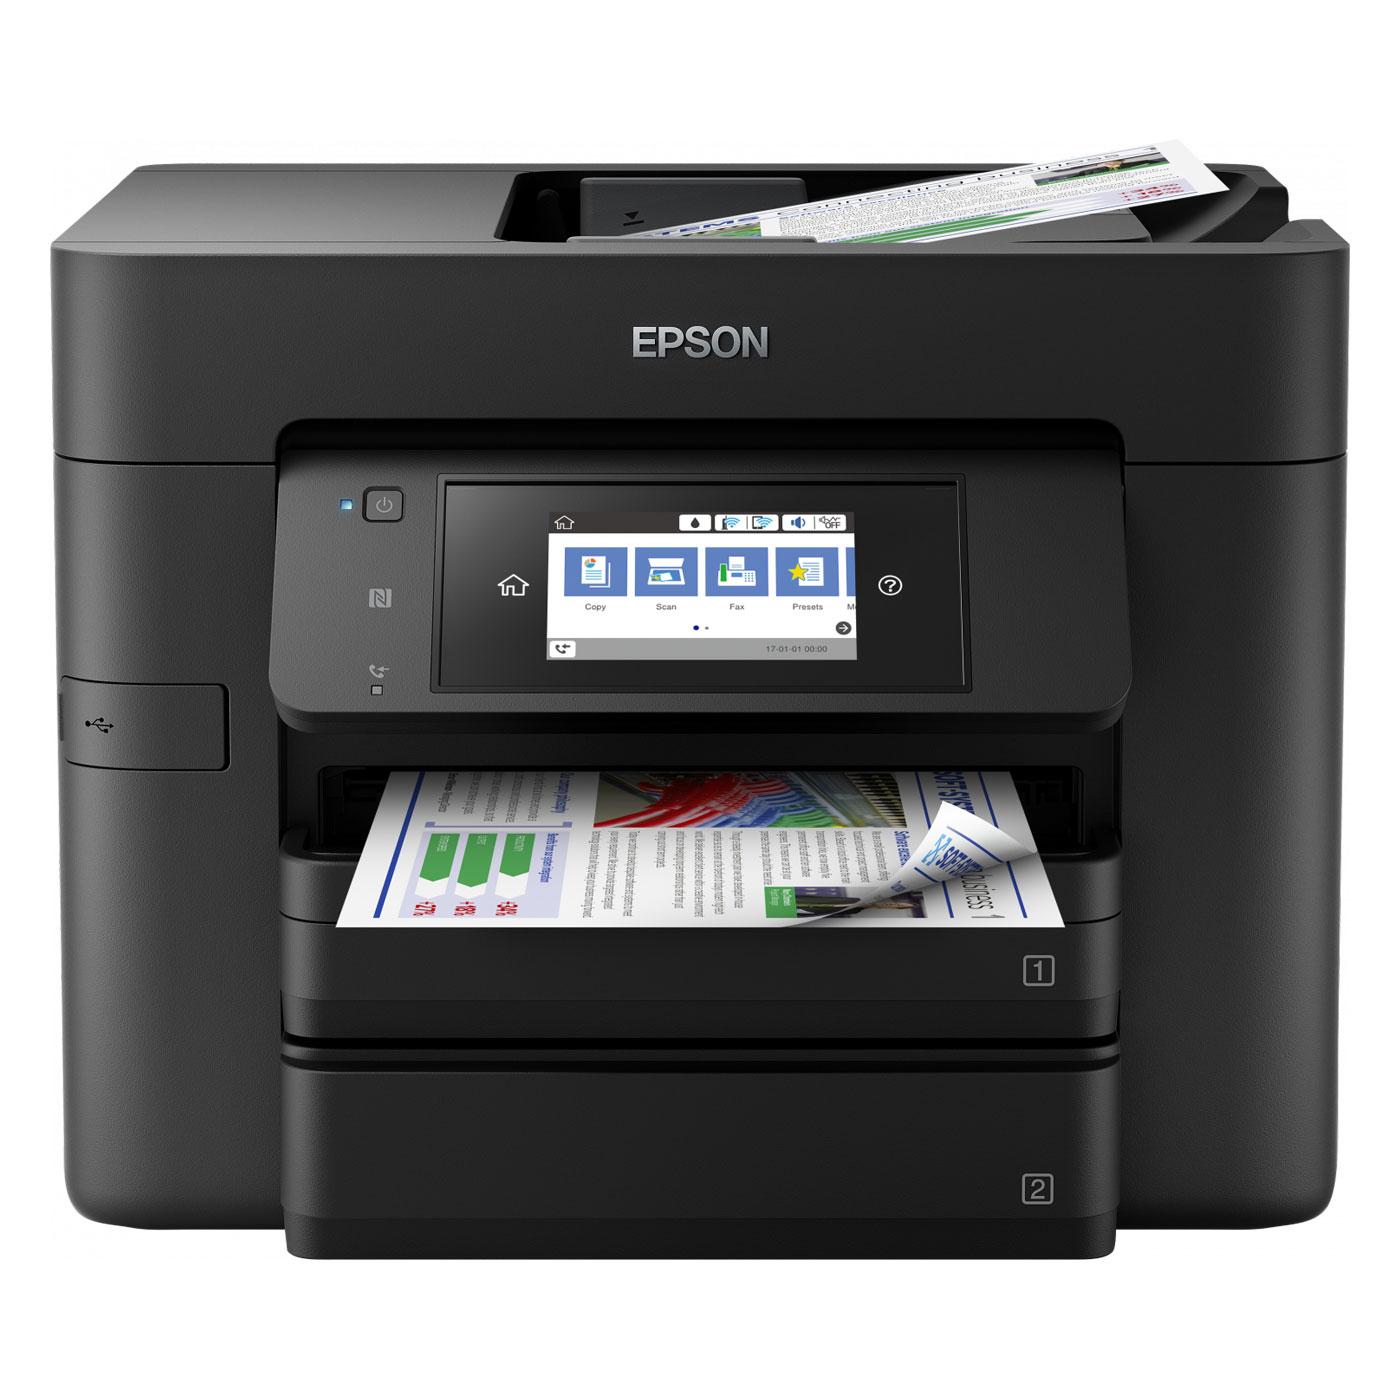 epson workforce pro wf 4740dtwf imprimante multifonction epson sur ldlc. Black Bedroom Furniture Sets. Home Design Ideas